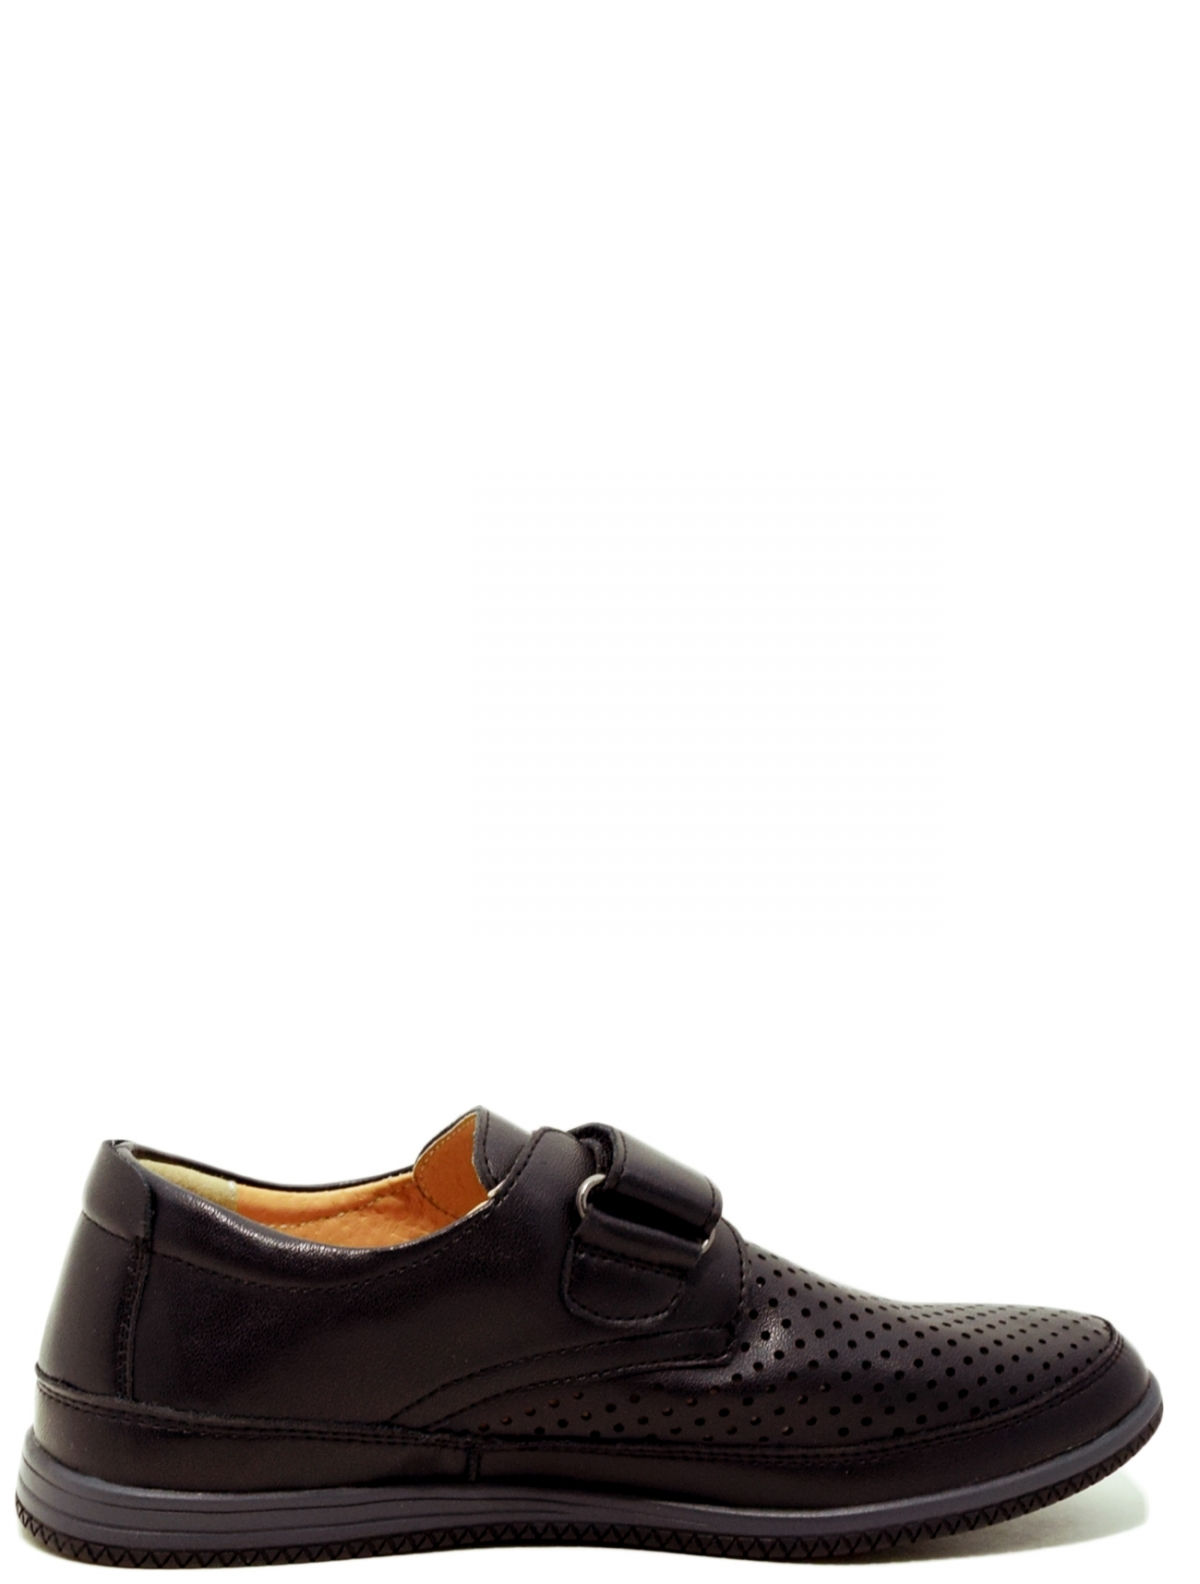 Ulet TD253-25 туфли для мальчика